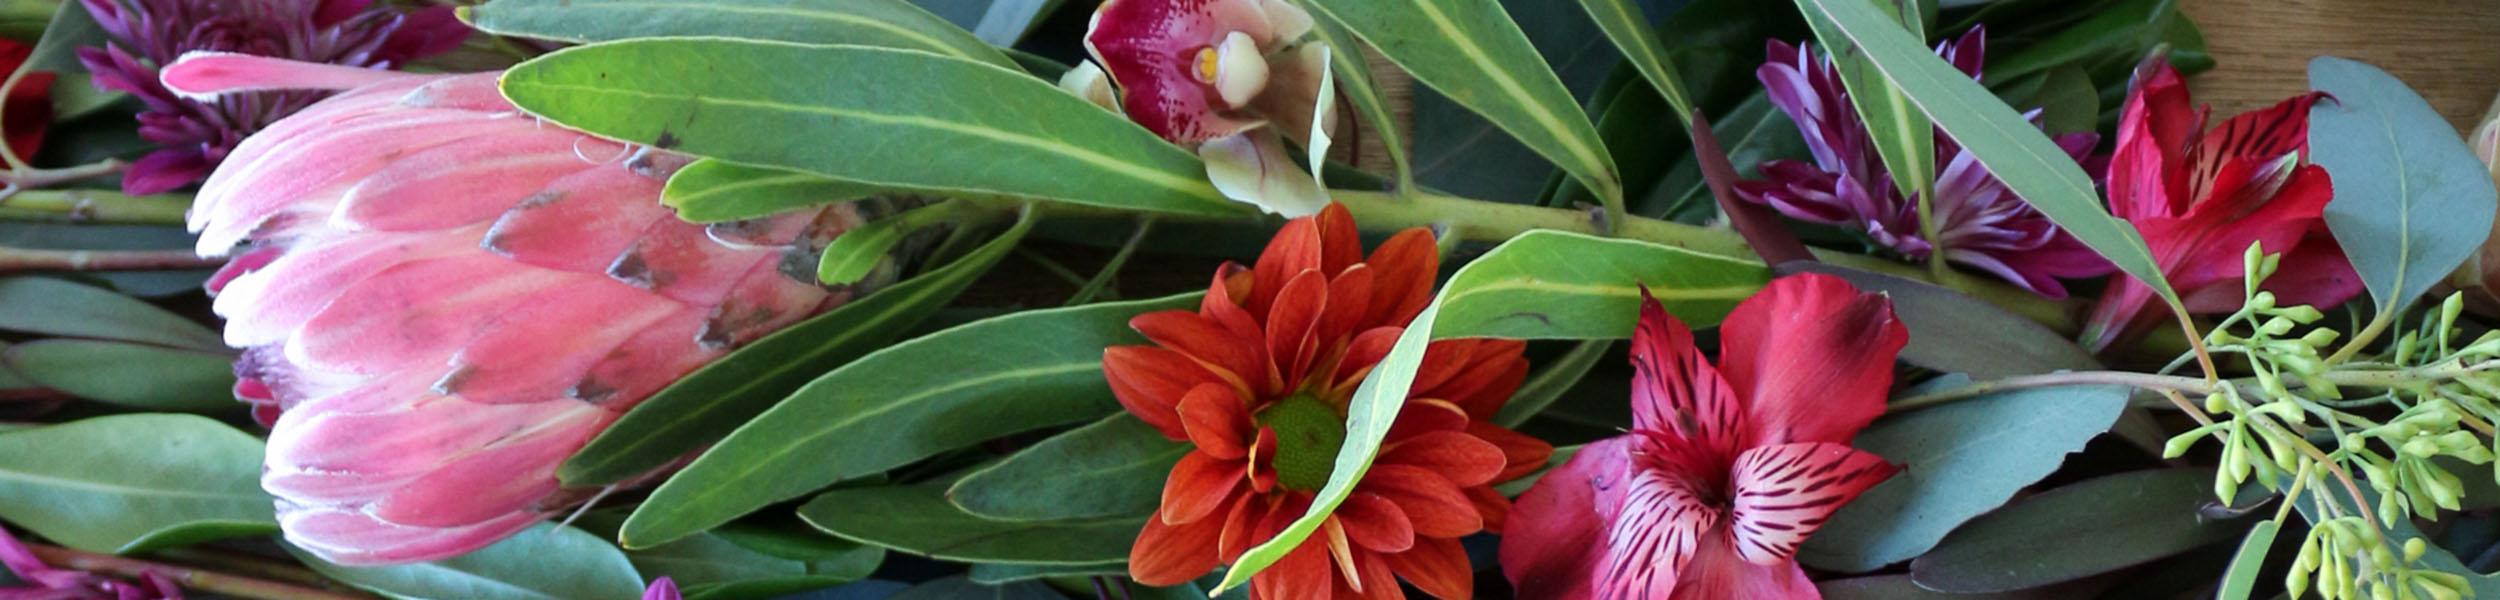 eucalyptus-flower-garland-holiday-tablescape-slider-1111lightlane